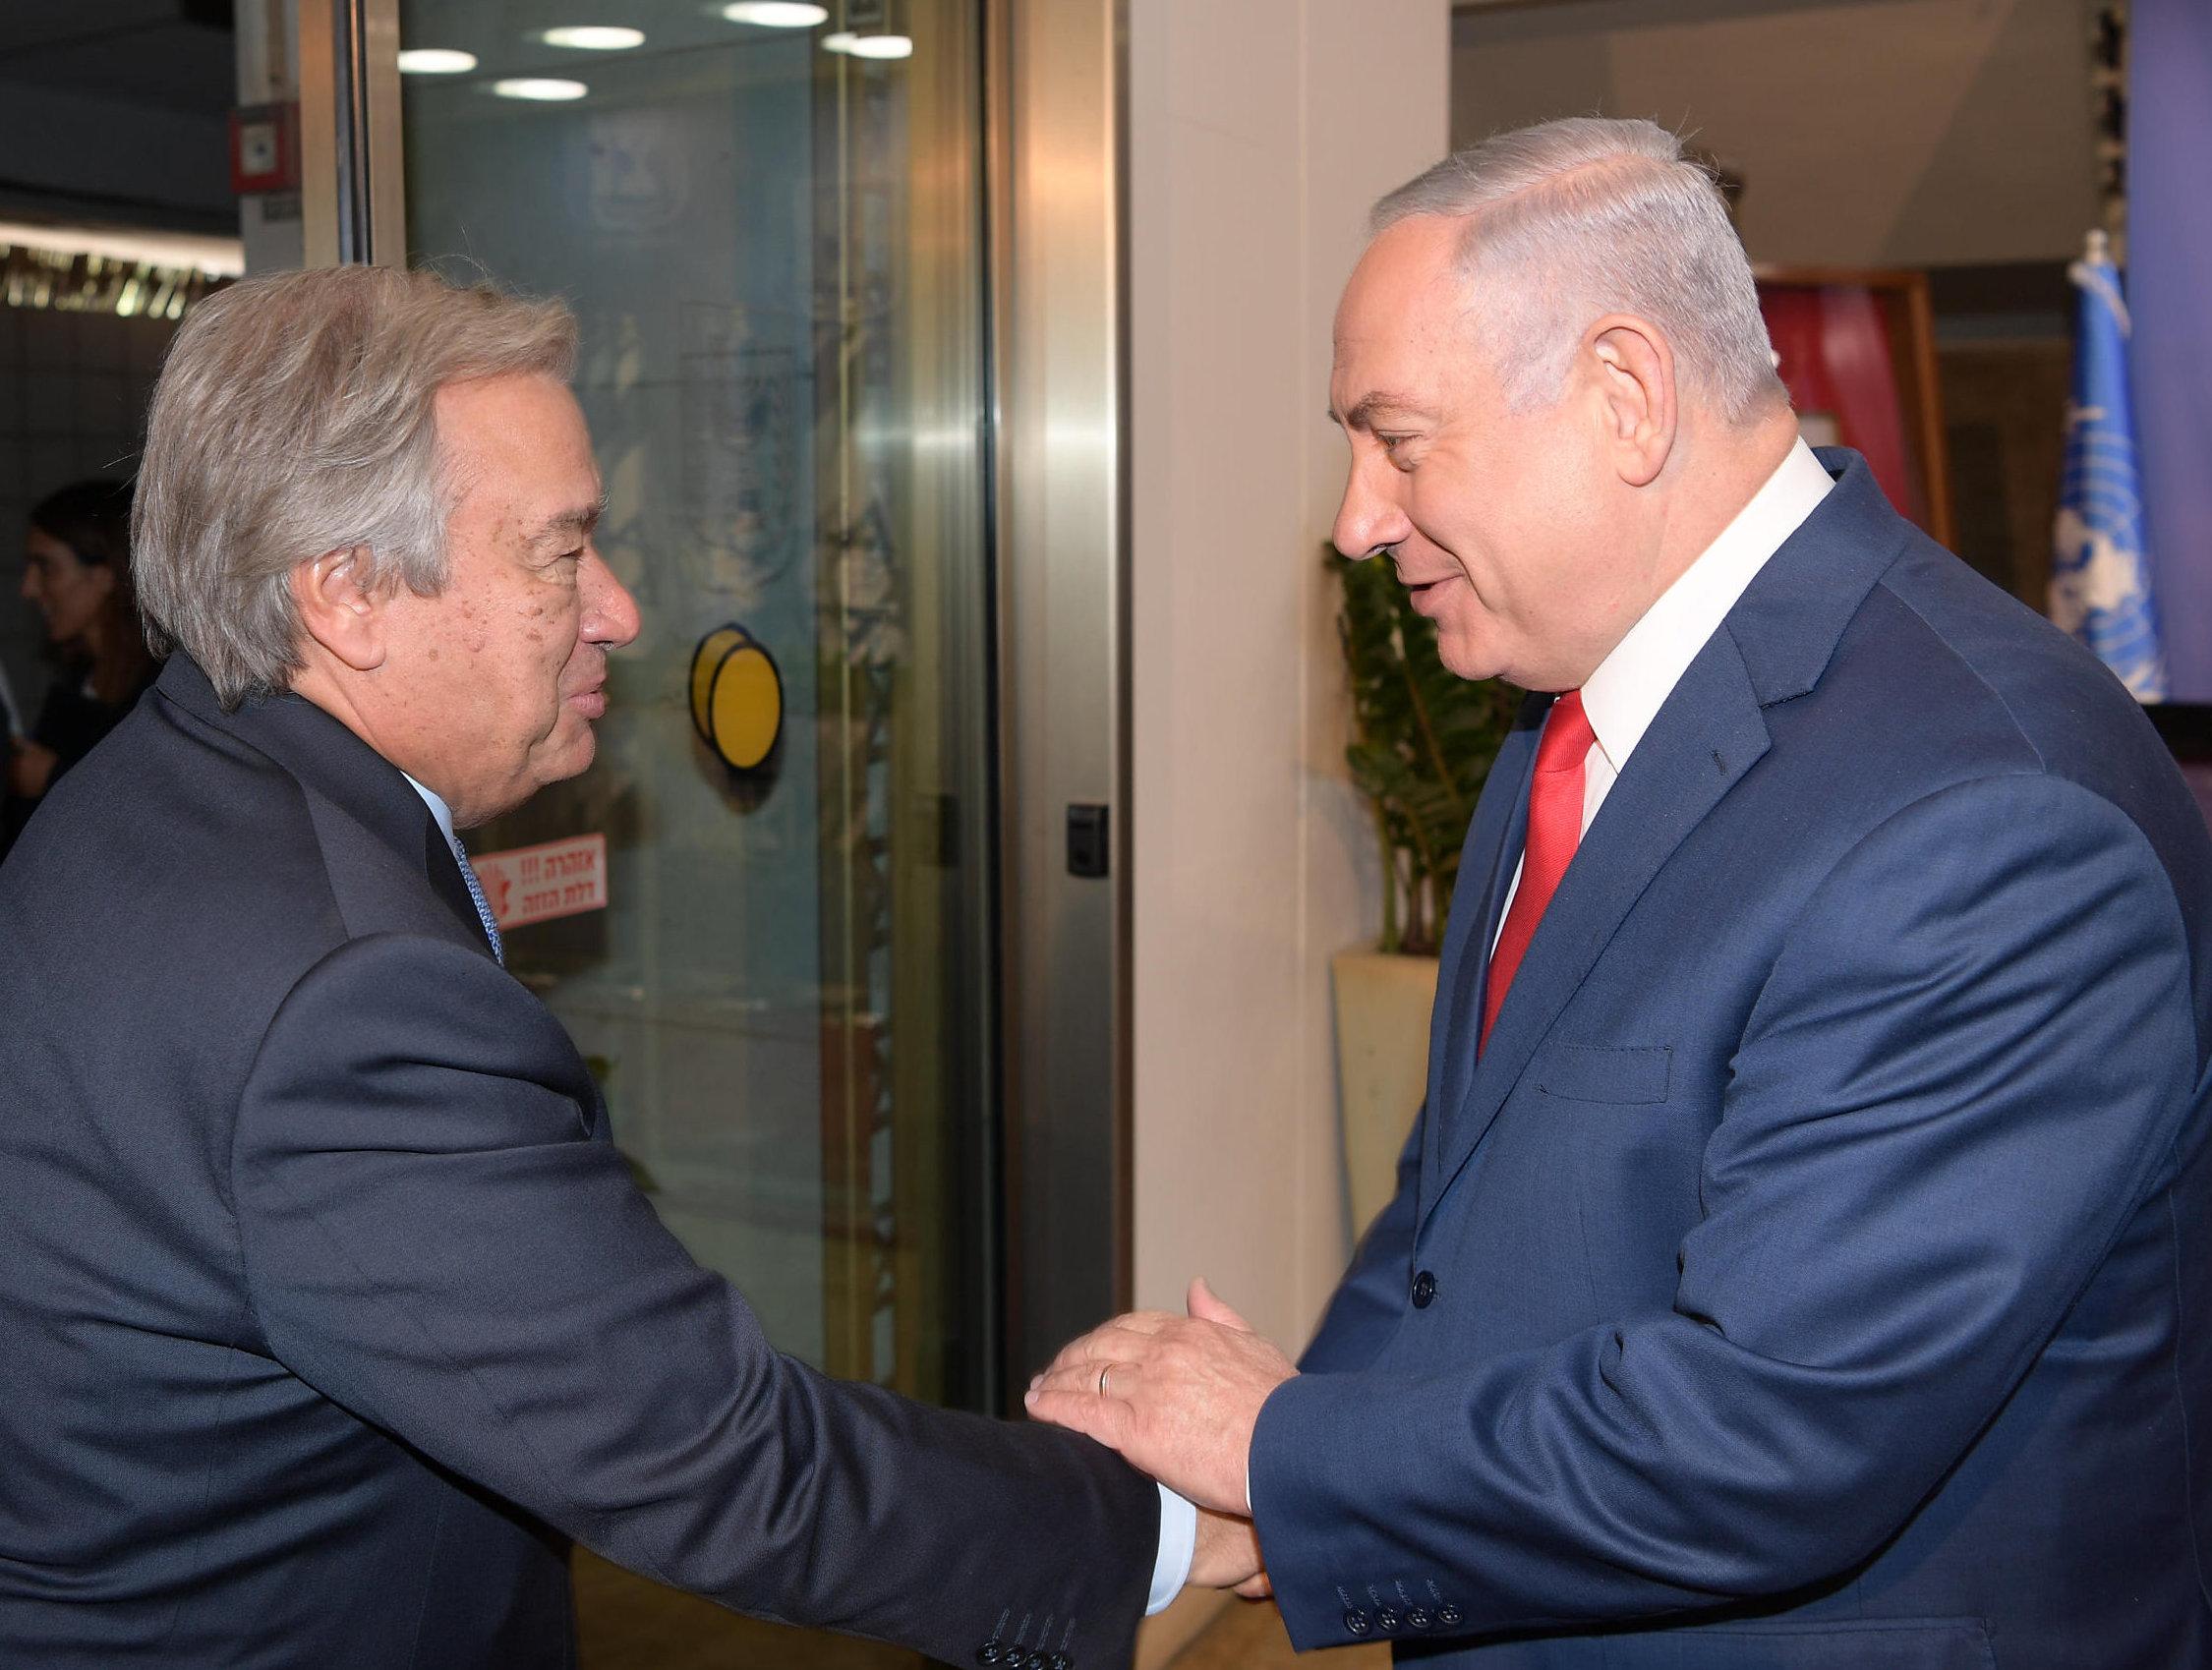 U.S. denies Kushner's team told Abbas a settlement freeze would topple Netanyahu